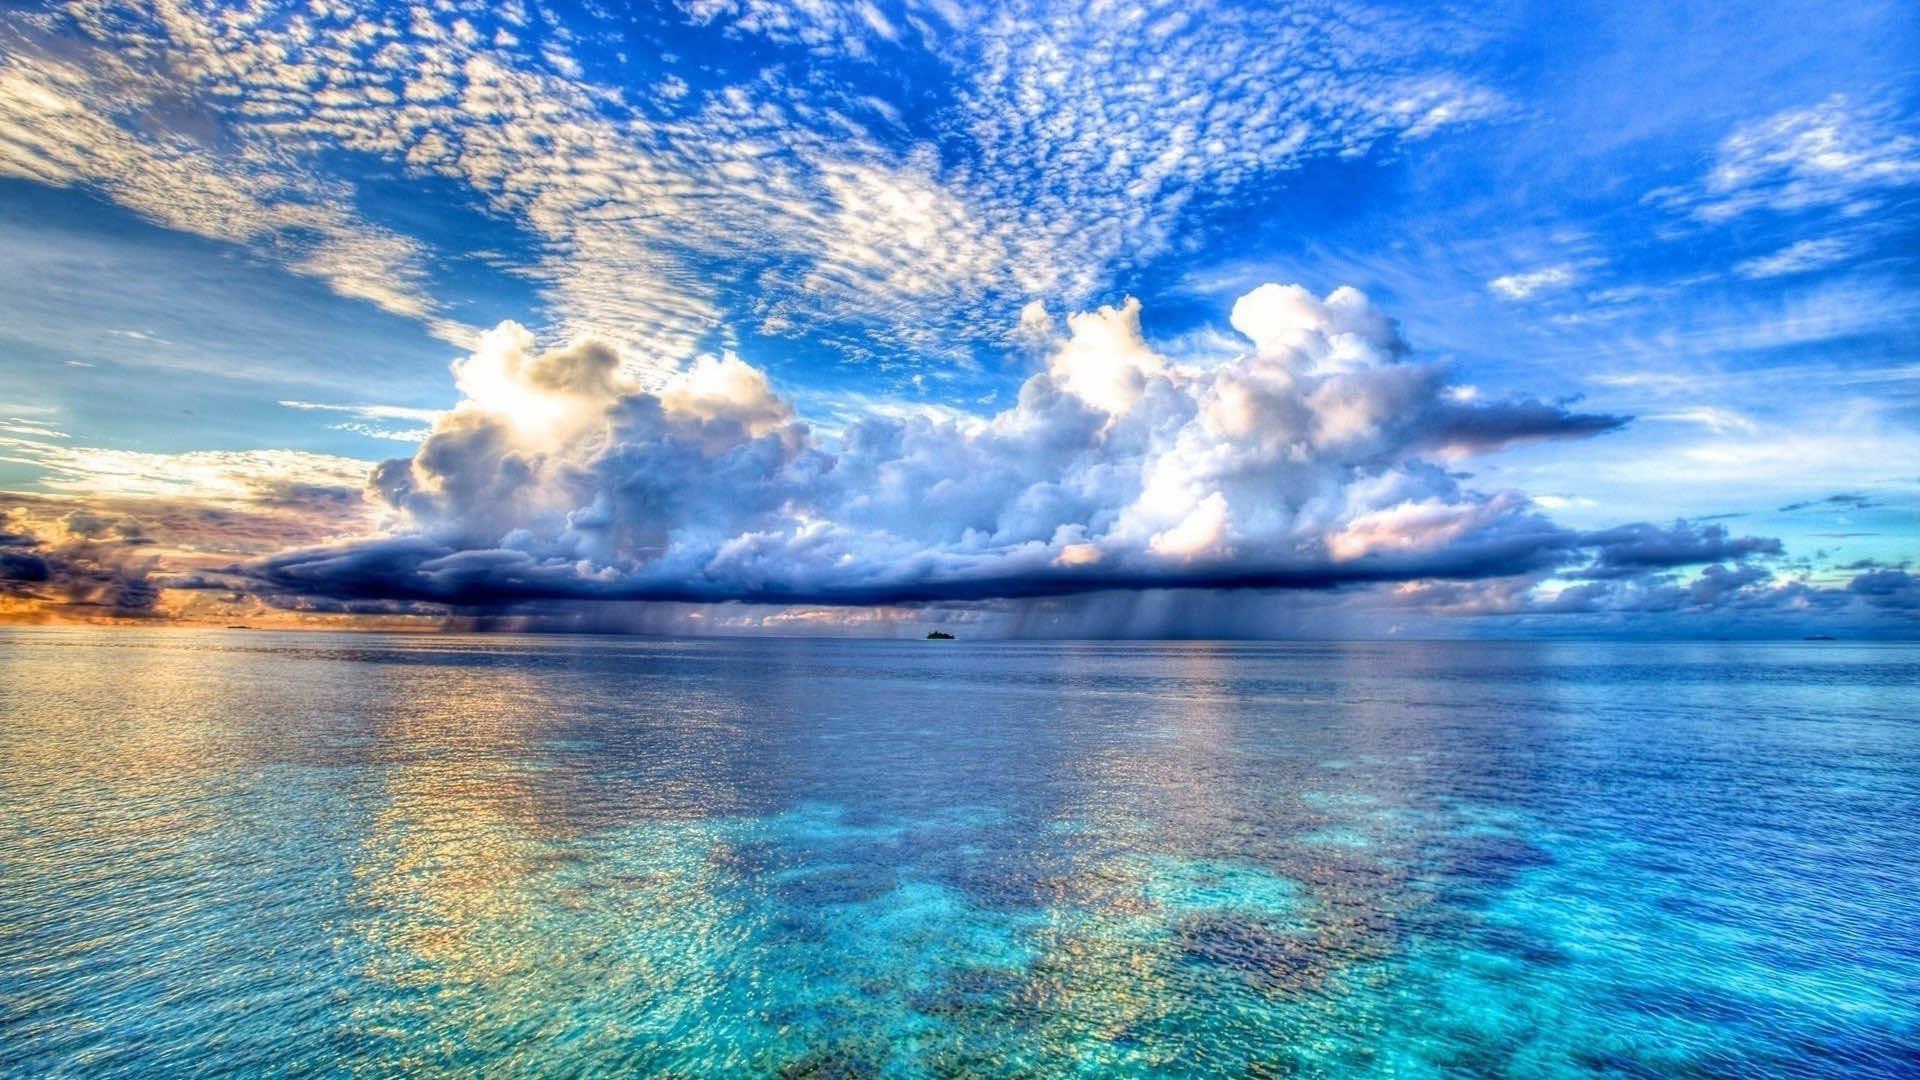 45 Beach Wallpaper For Mobile And Desktop In Full HD For ...